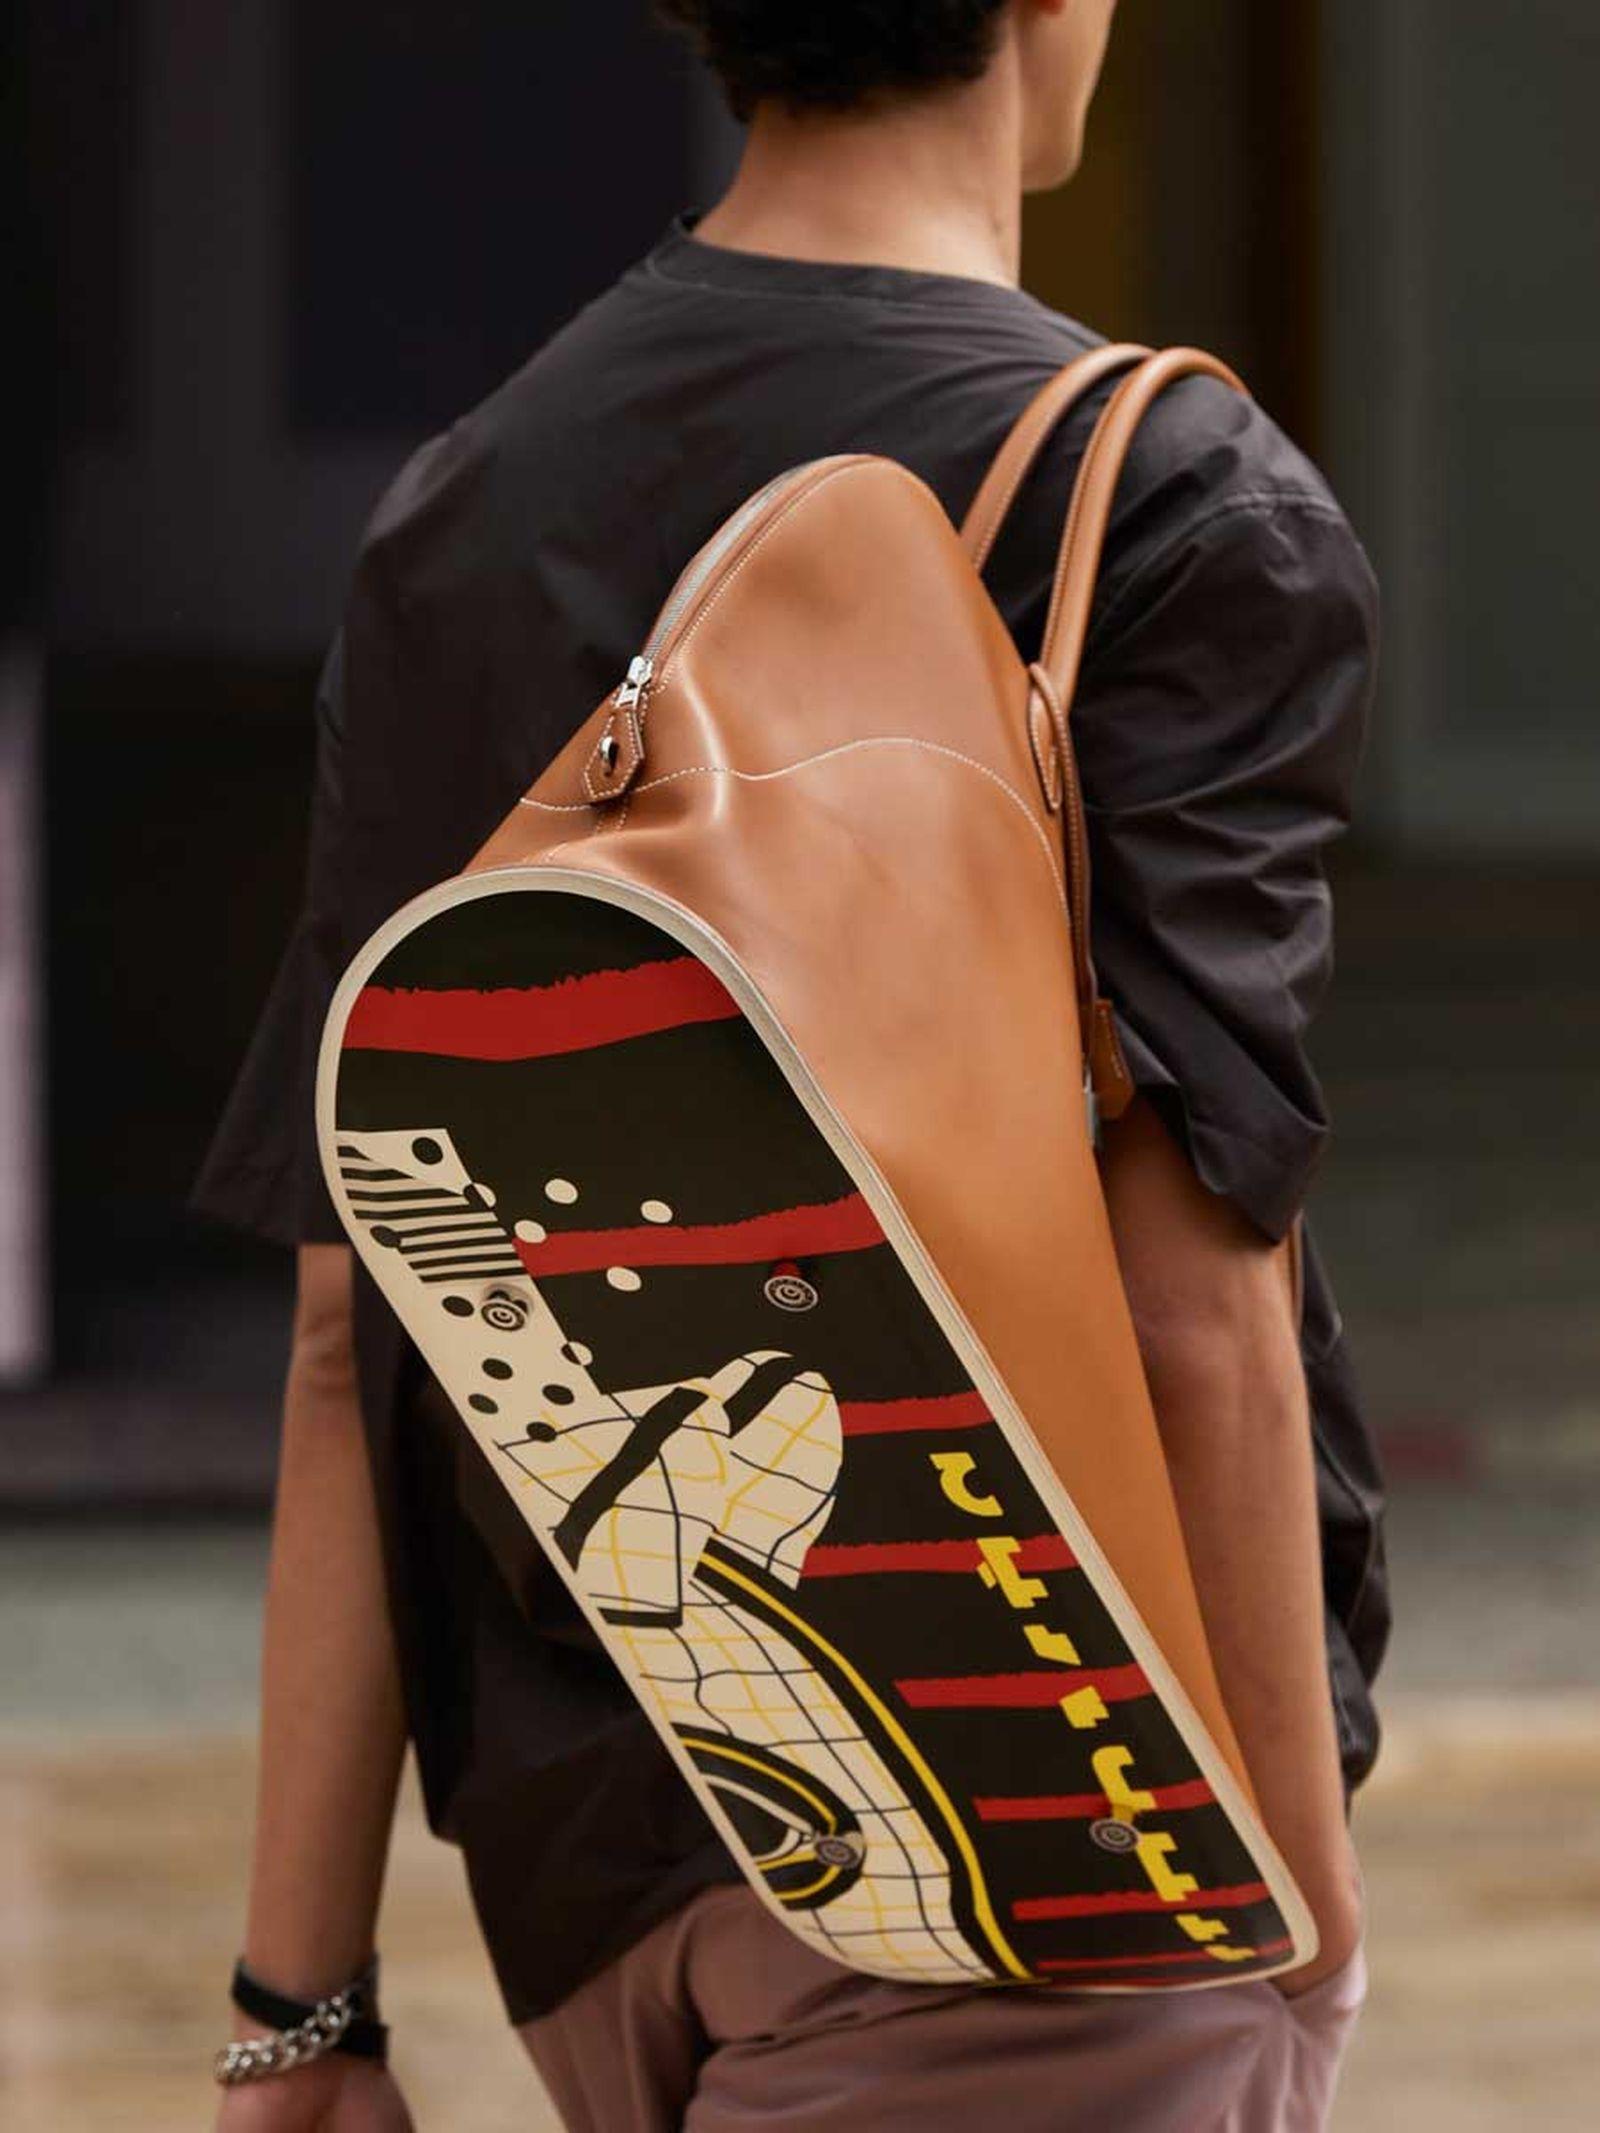 hermes skateboard bolide bag charm spring summer 2022 runway menswear